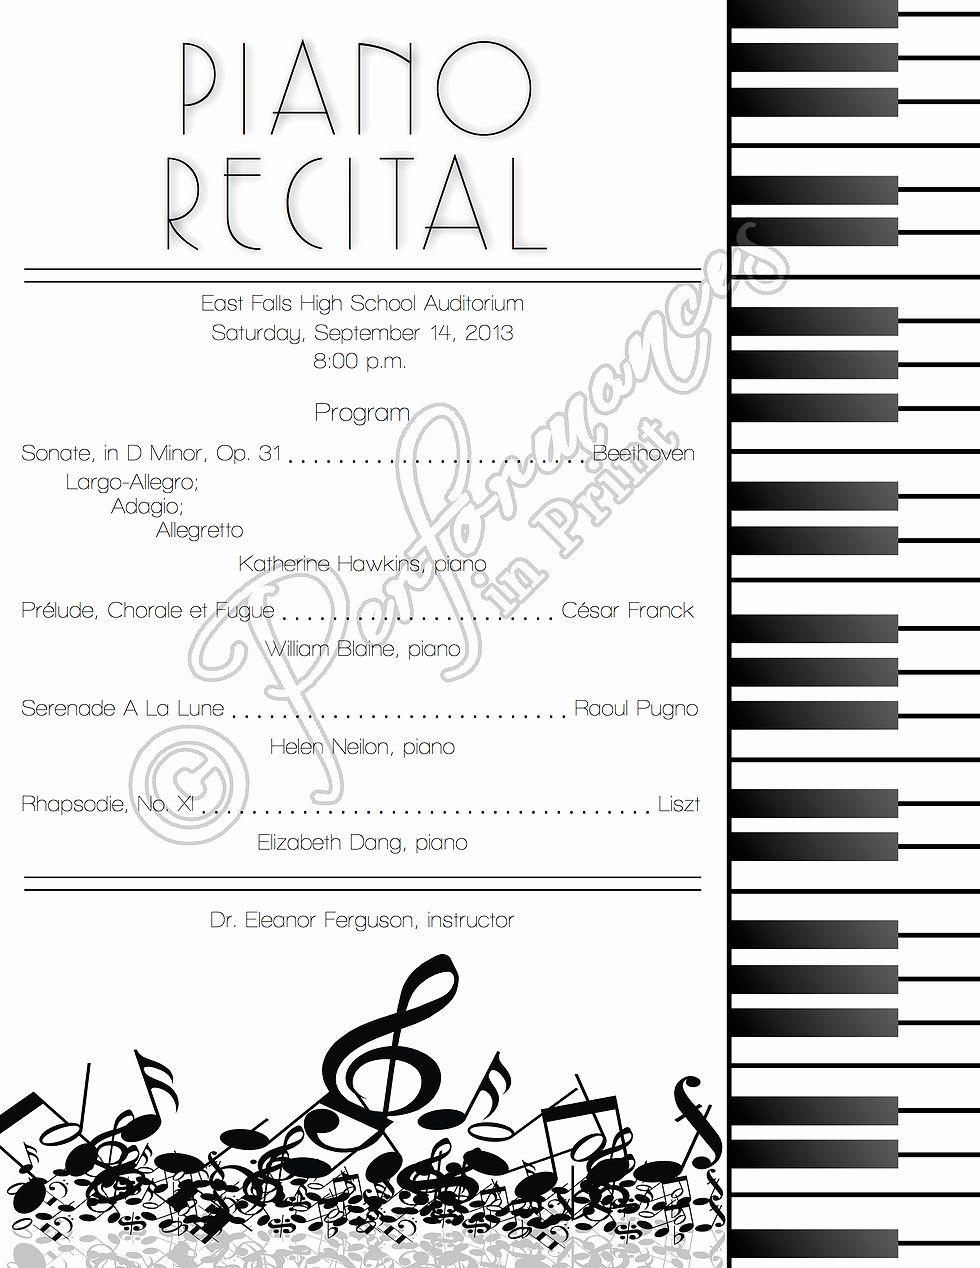 Concert Program Template Free Beautiful Piano Recital Concert Music Program Piano Recital Piano Recital Gifts Piano Teaching